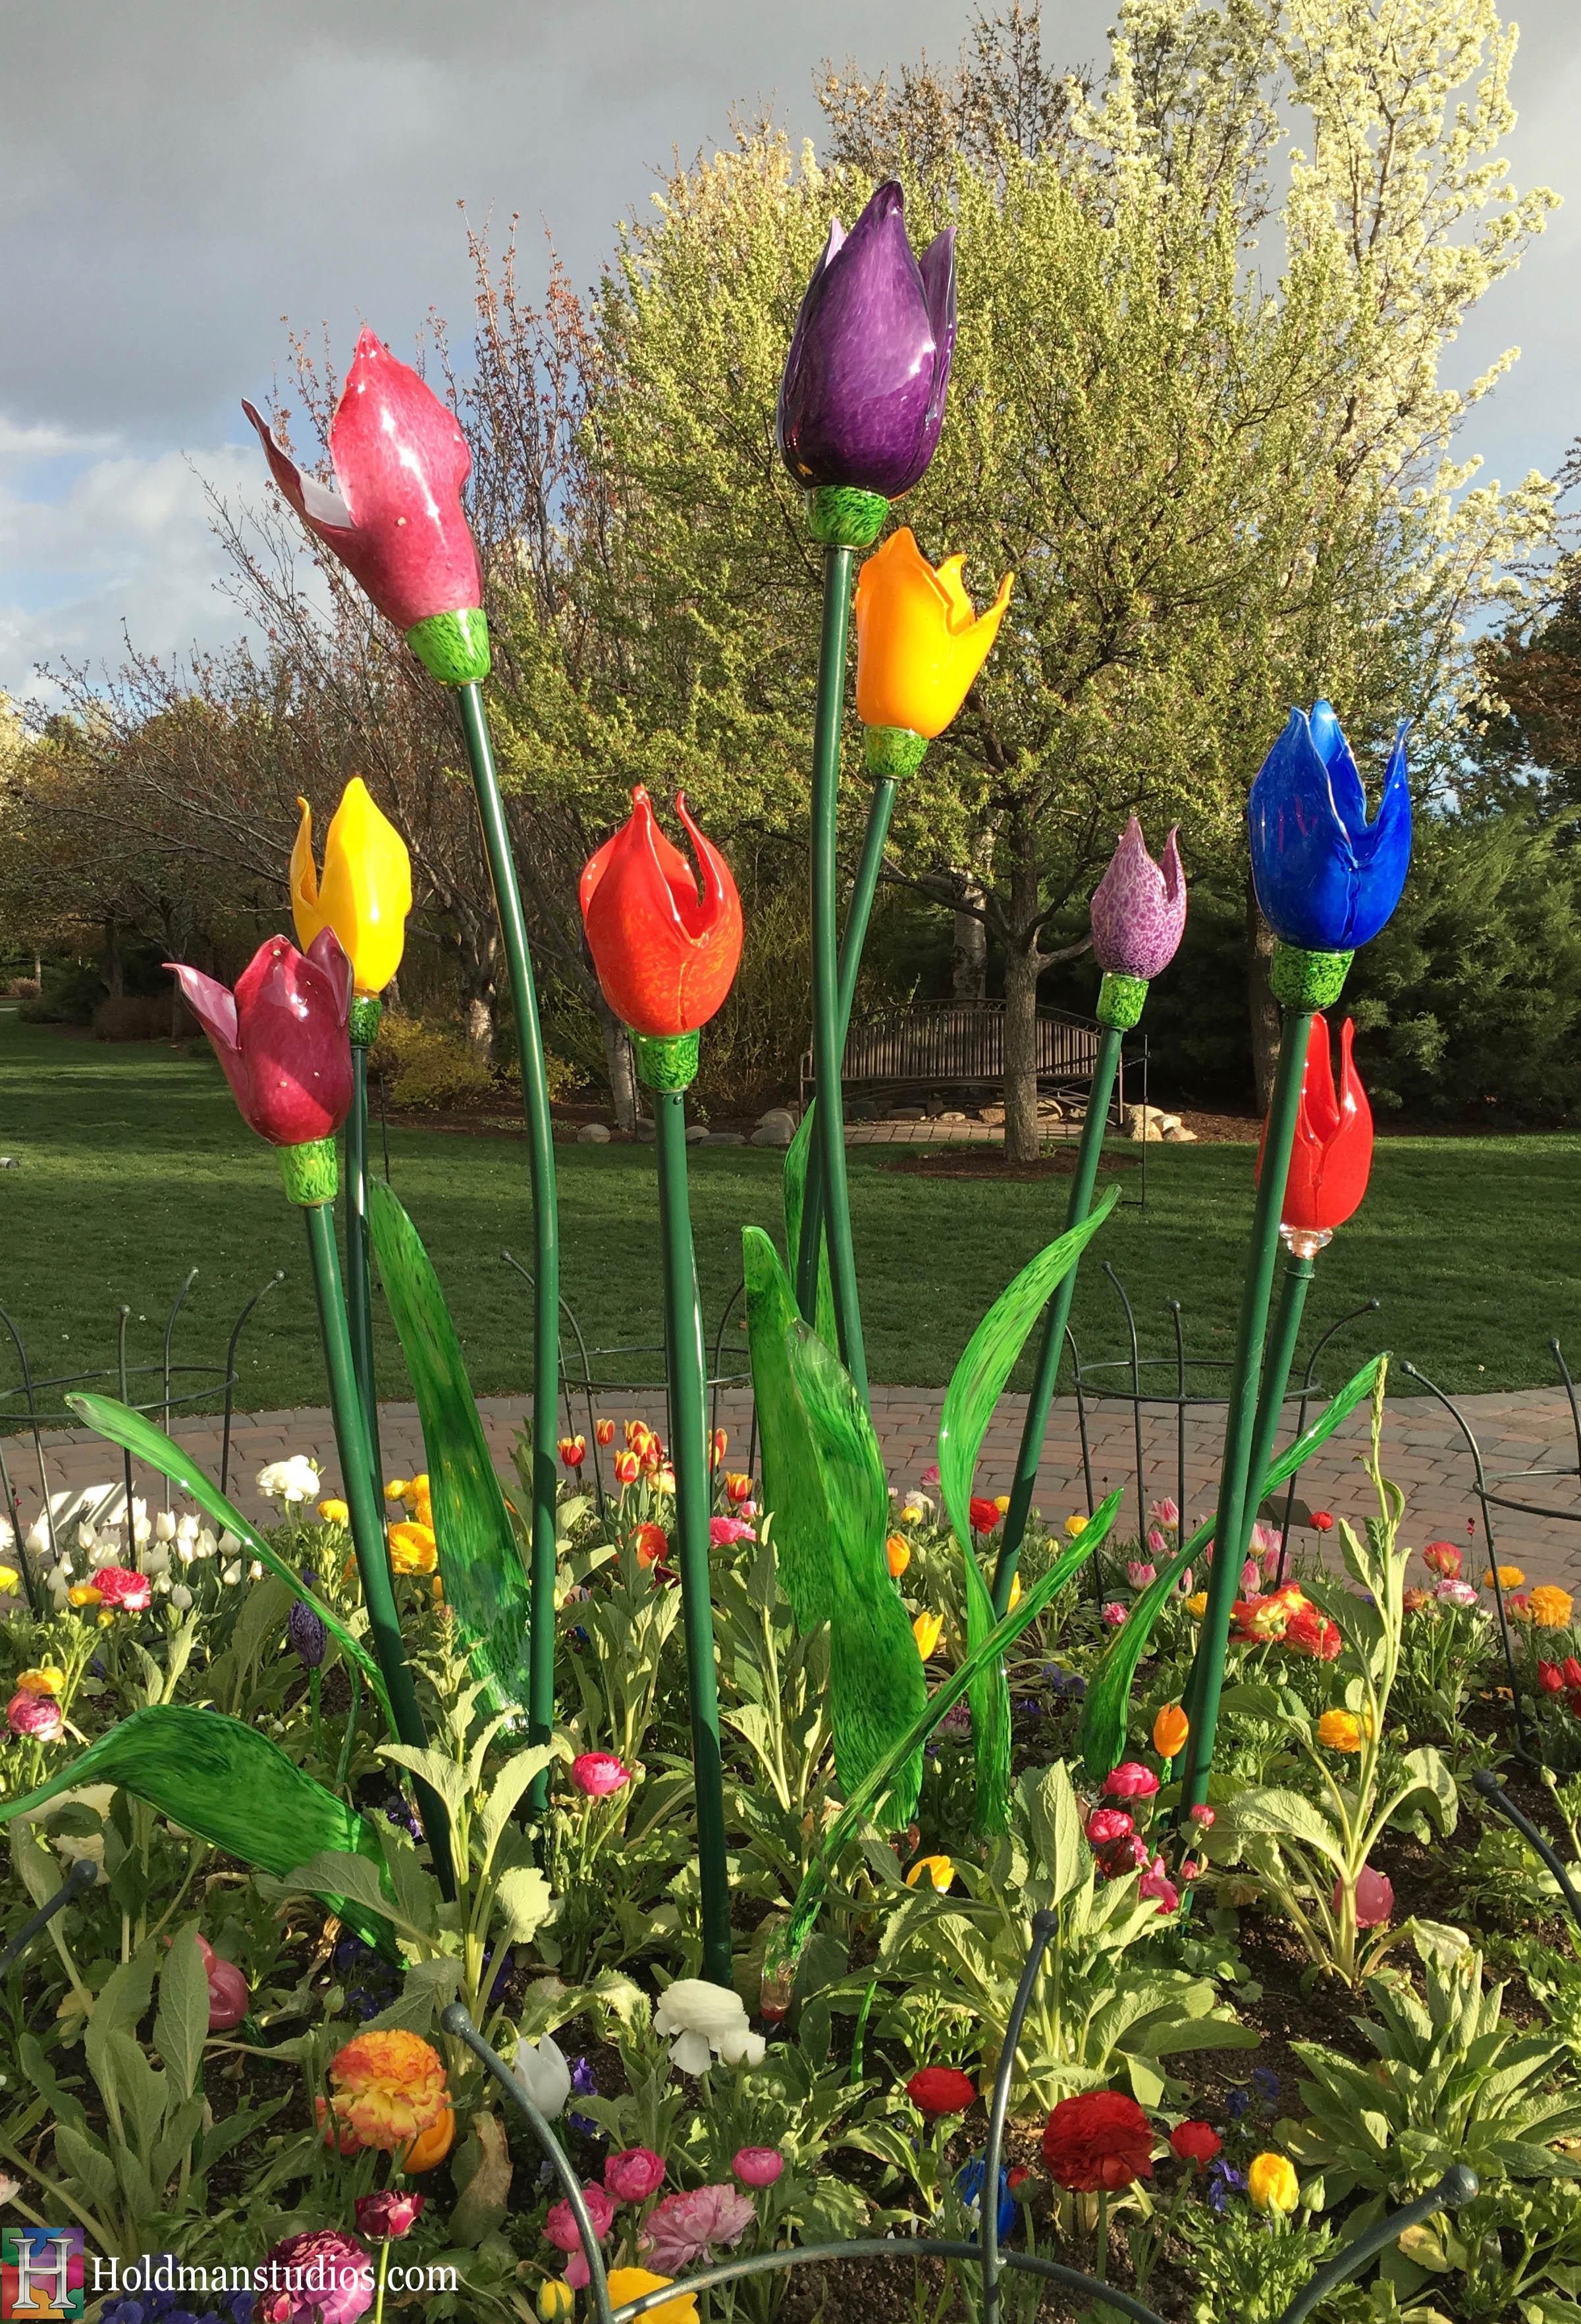 Blown Glass_Ashton Garden Tulips 2.jpg